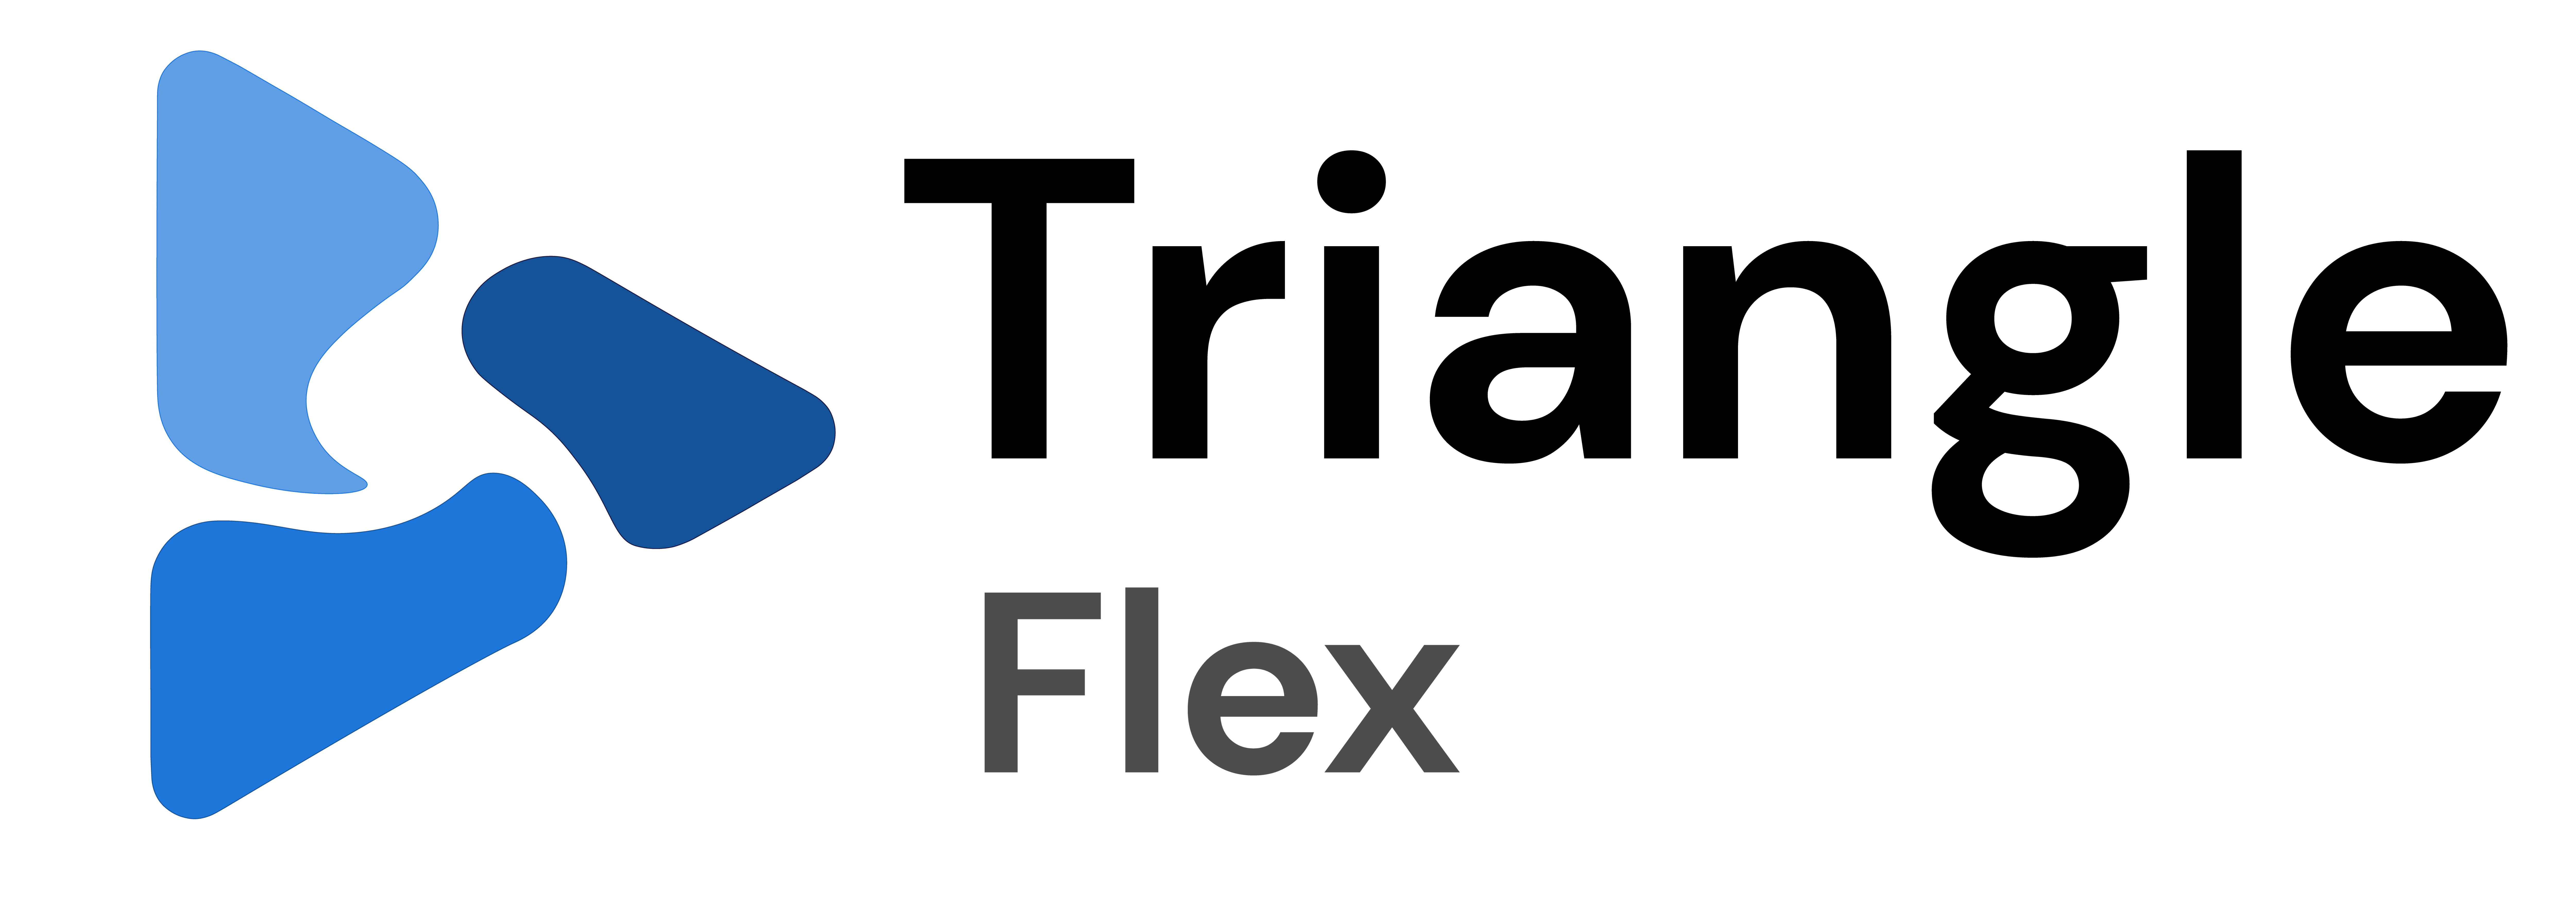 Triangle Flex Logo